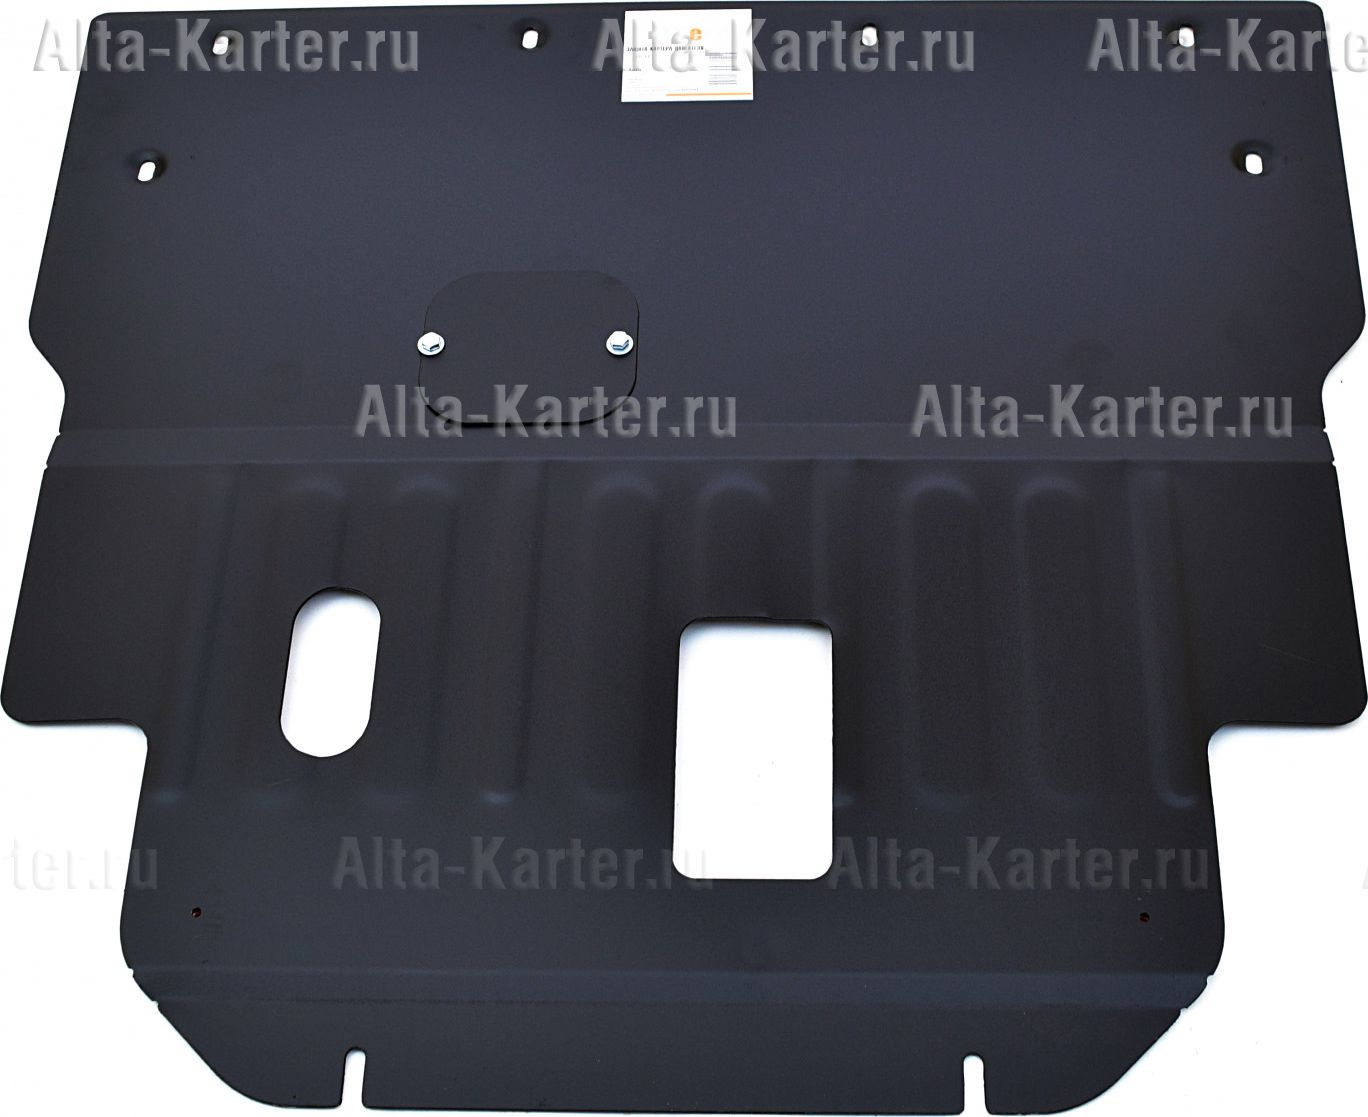 Защита Alfeco для картера и КПП Hyundai i40 2012-2021. Артикул ALF.10.31